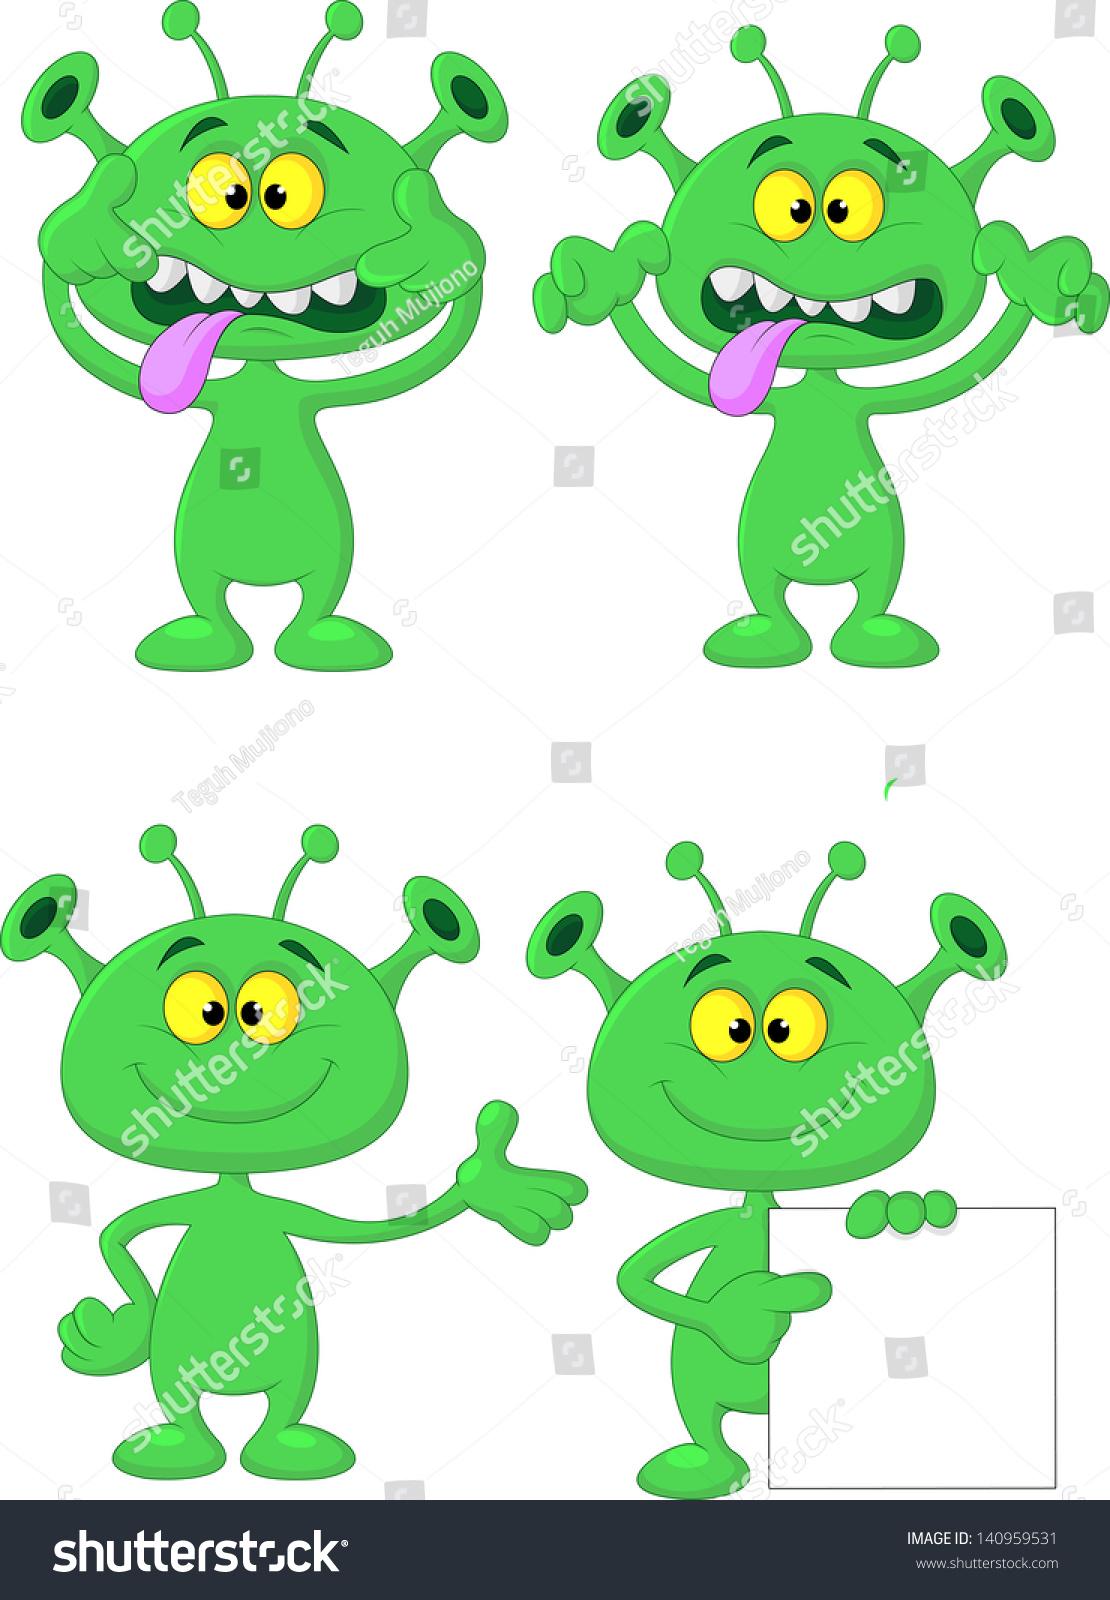 Cute green alien cartoon collection set stock illustration